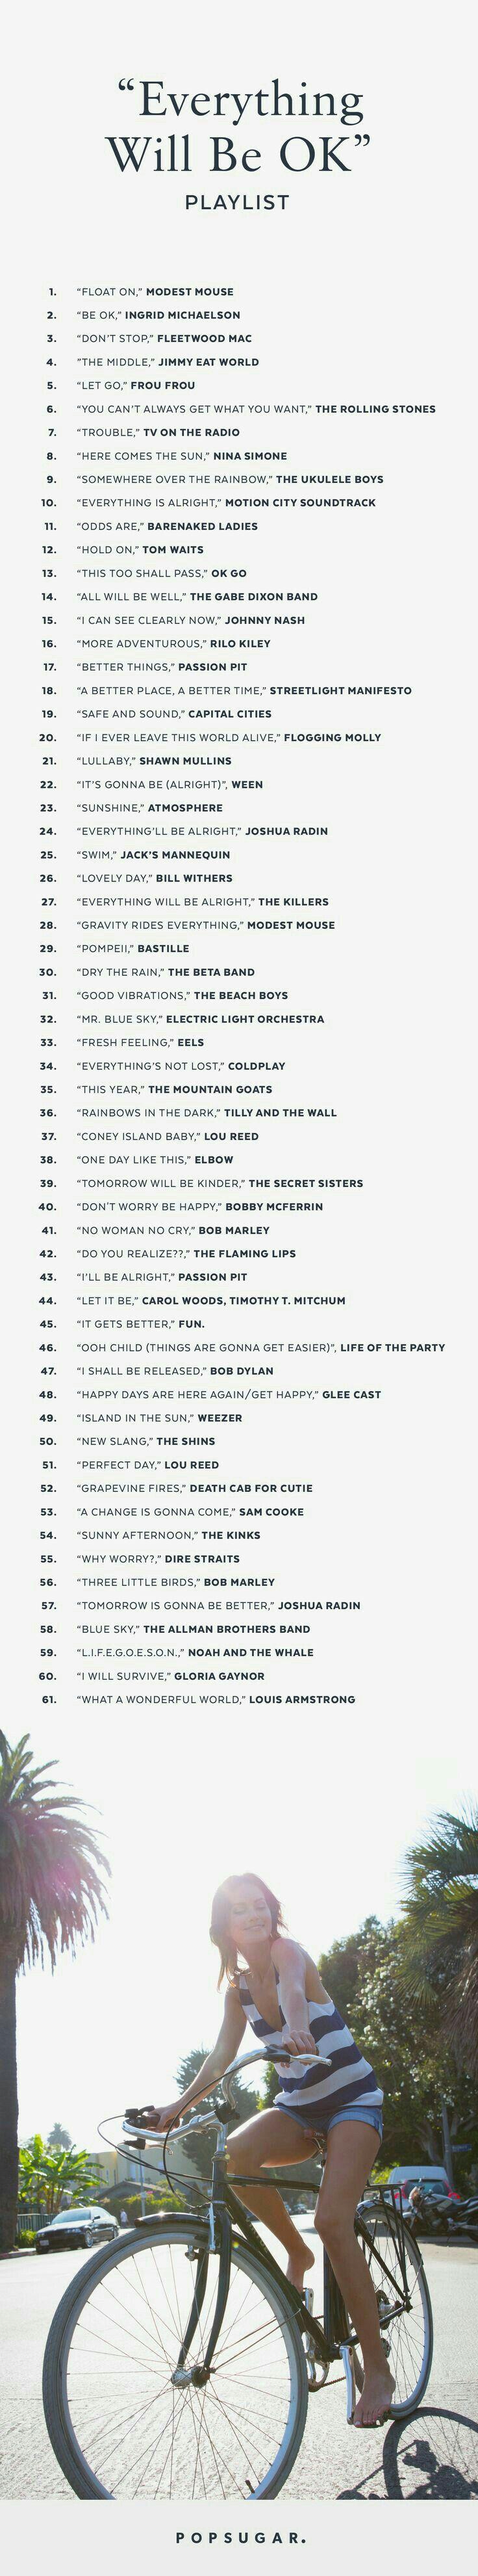 Everything will be OK playlist